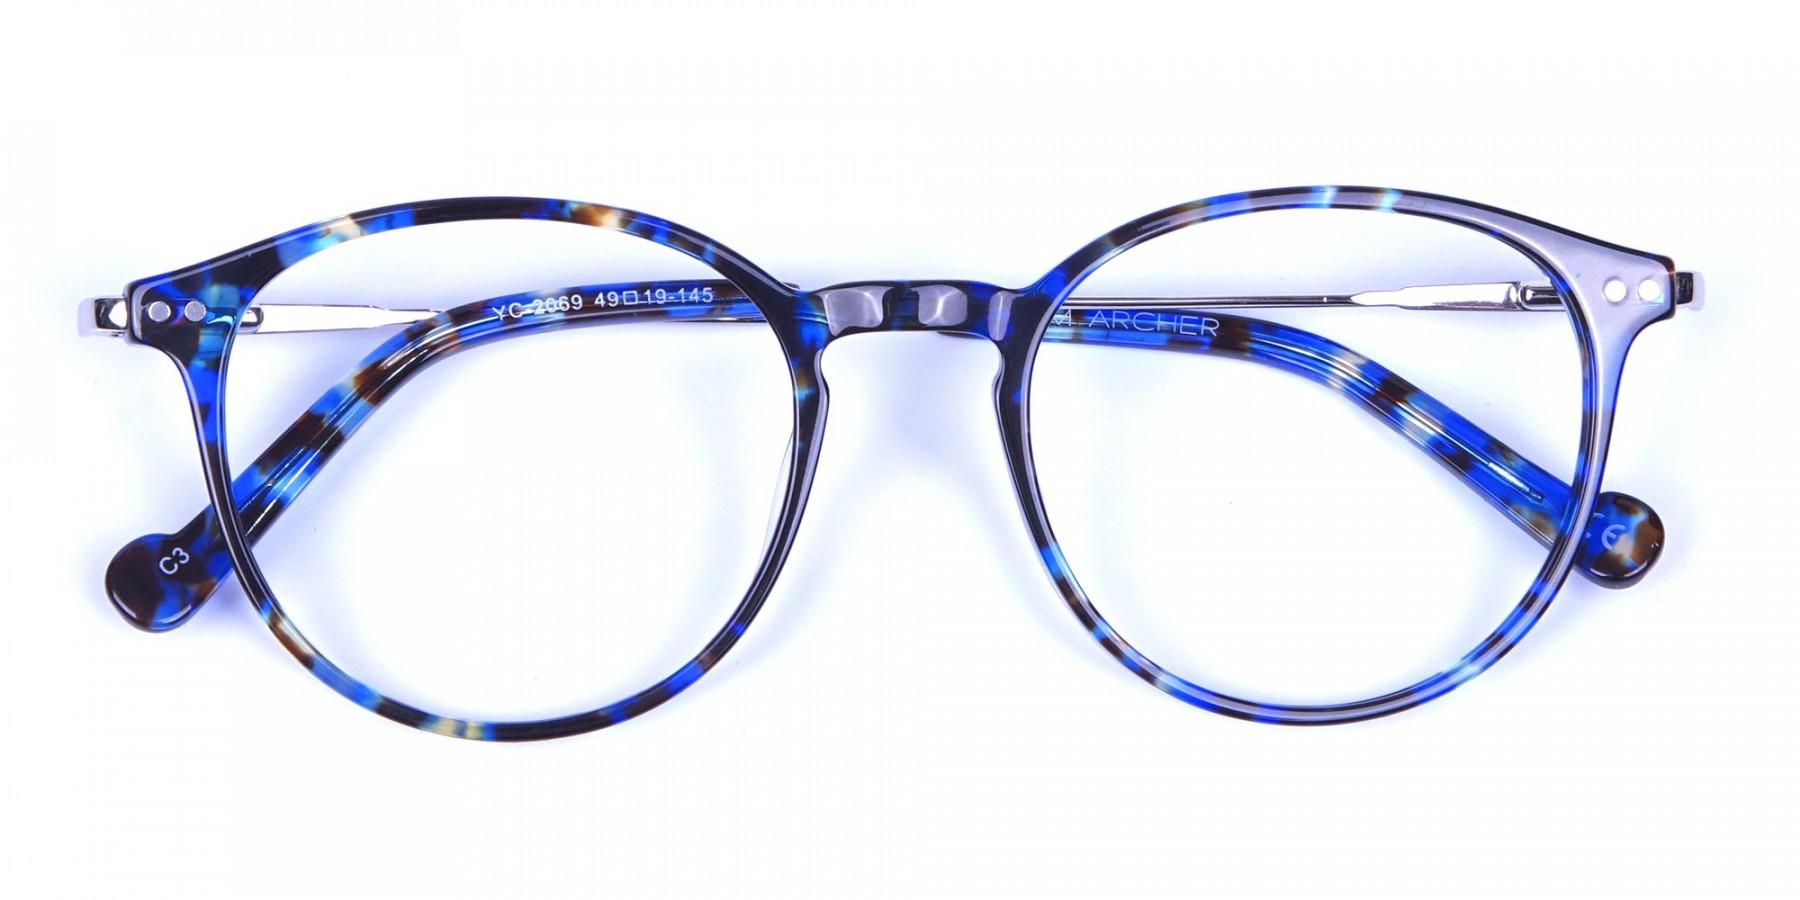 Ocean Blue Tortoise Glasses in Round